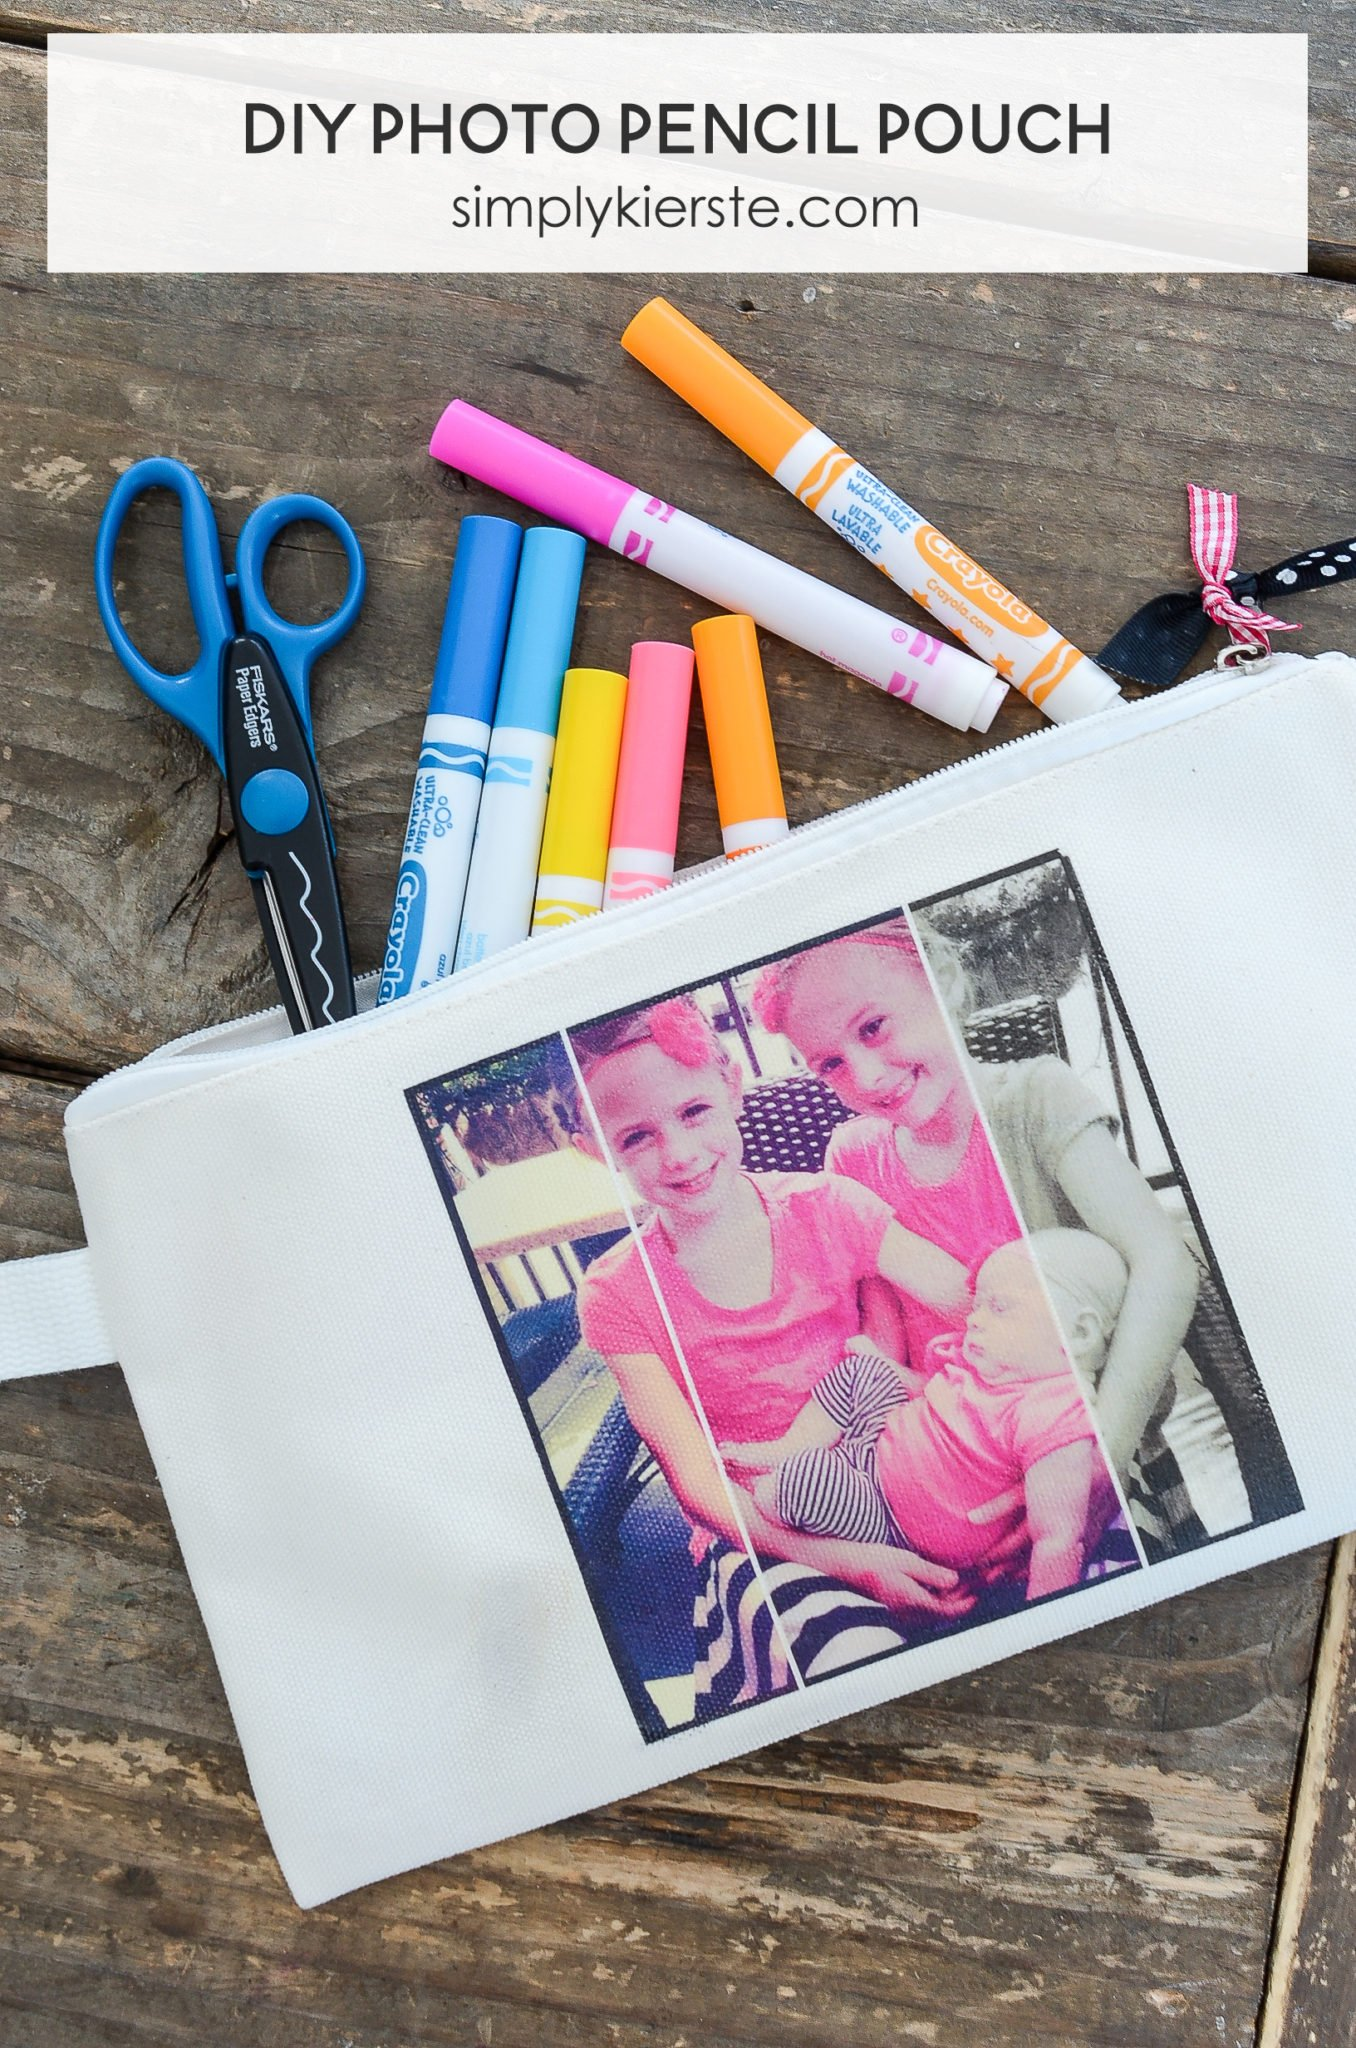 DIY Photo Pencil Pouch